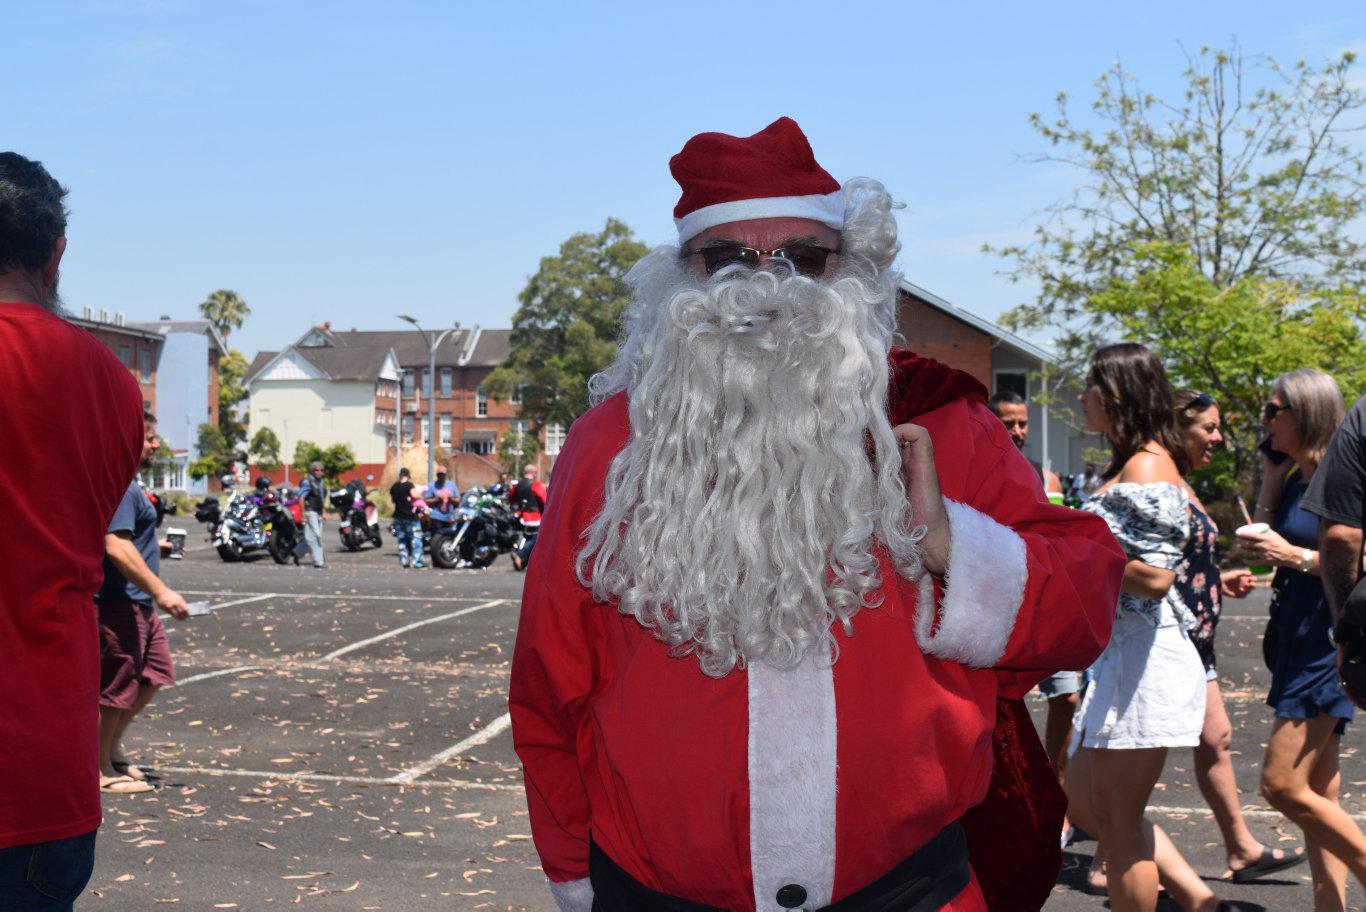 Santa attend the toy run each year.